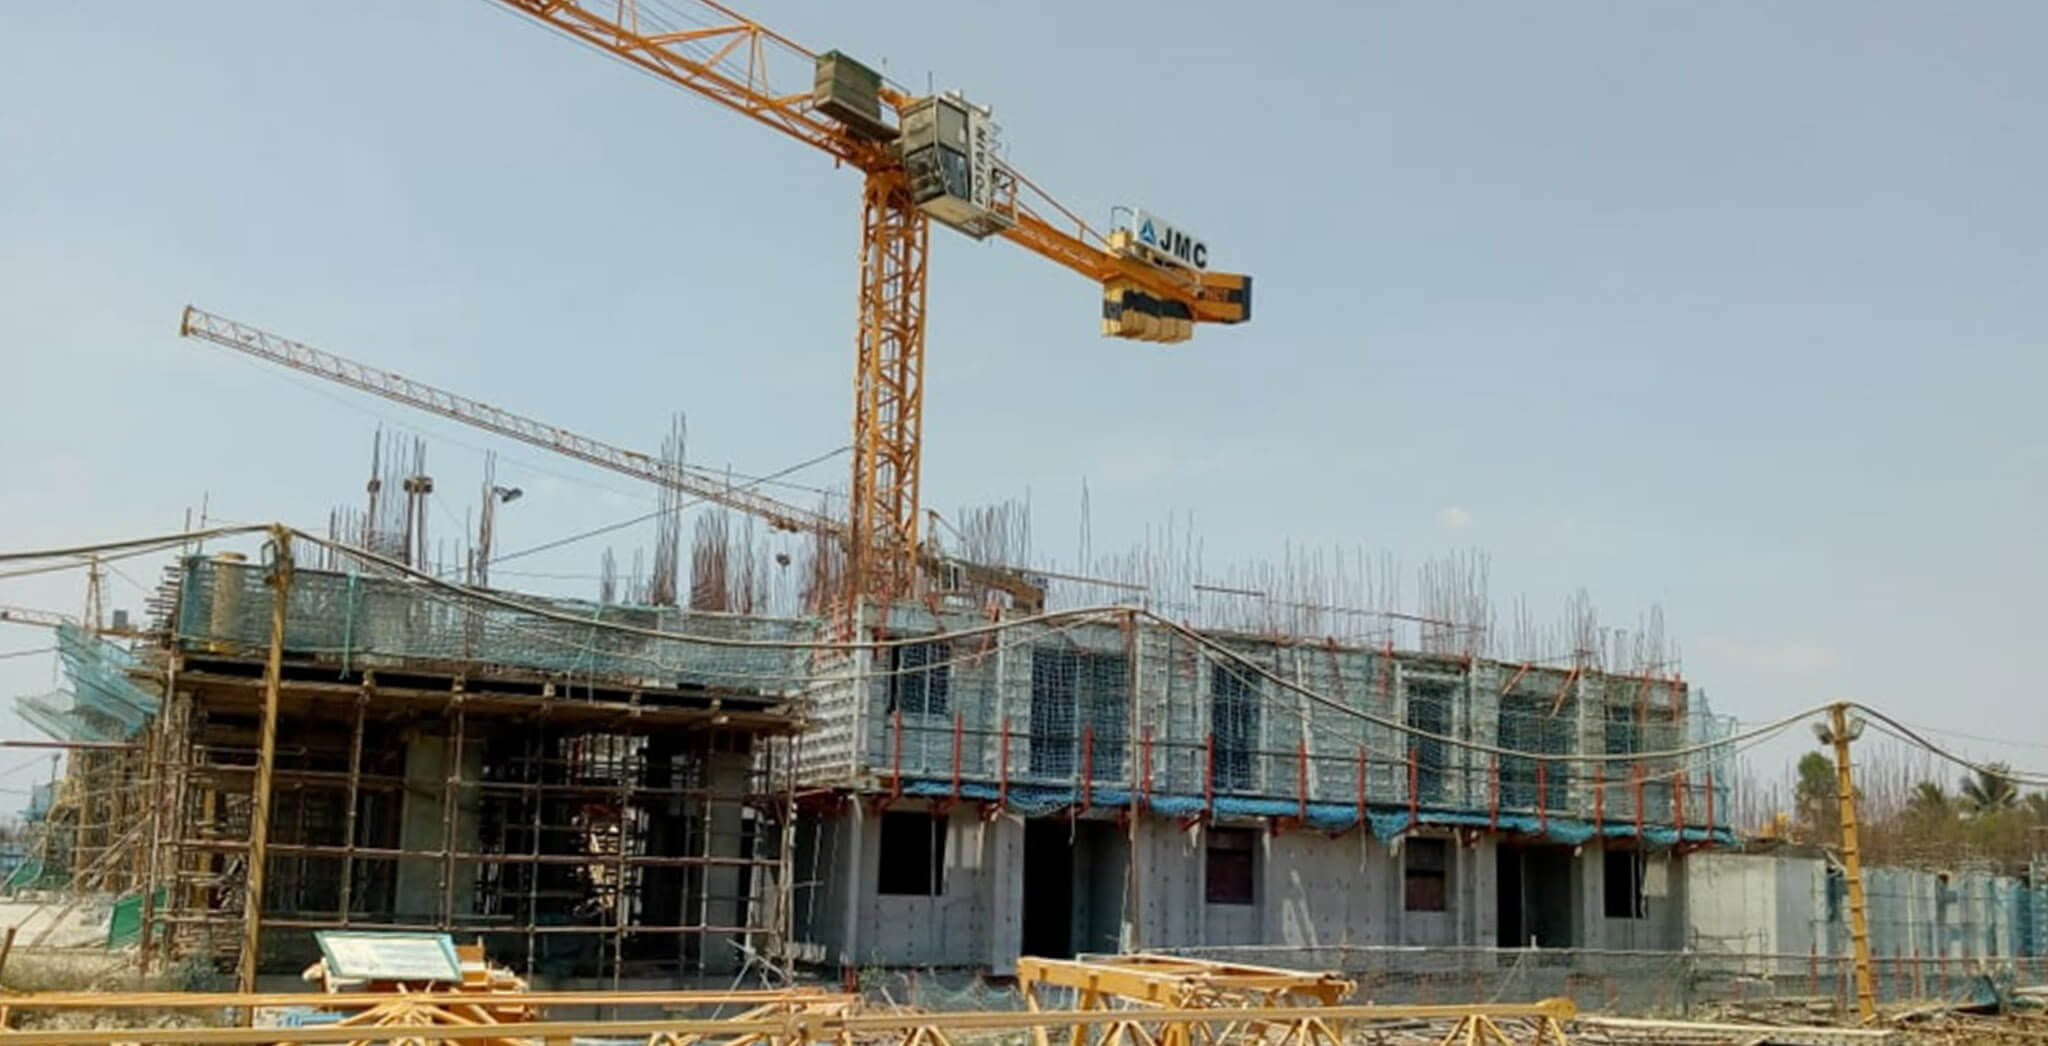 Mar 2020 - Eden—Tower E: First floor slab 50% completed; Second floor slab work-in-progress